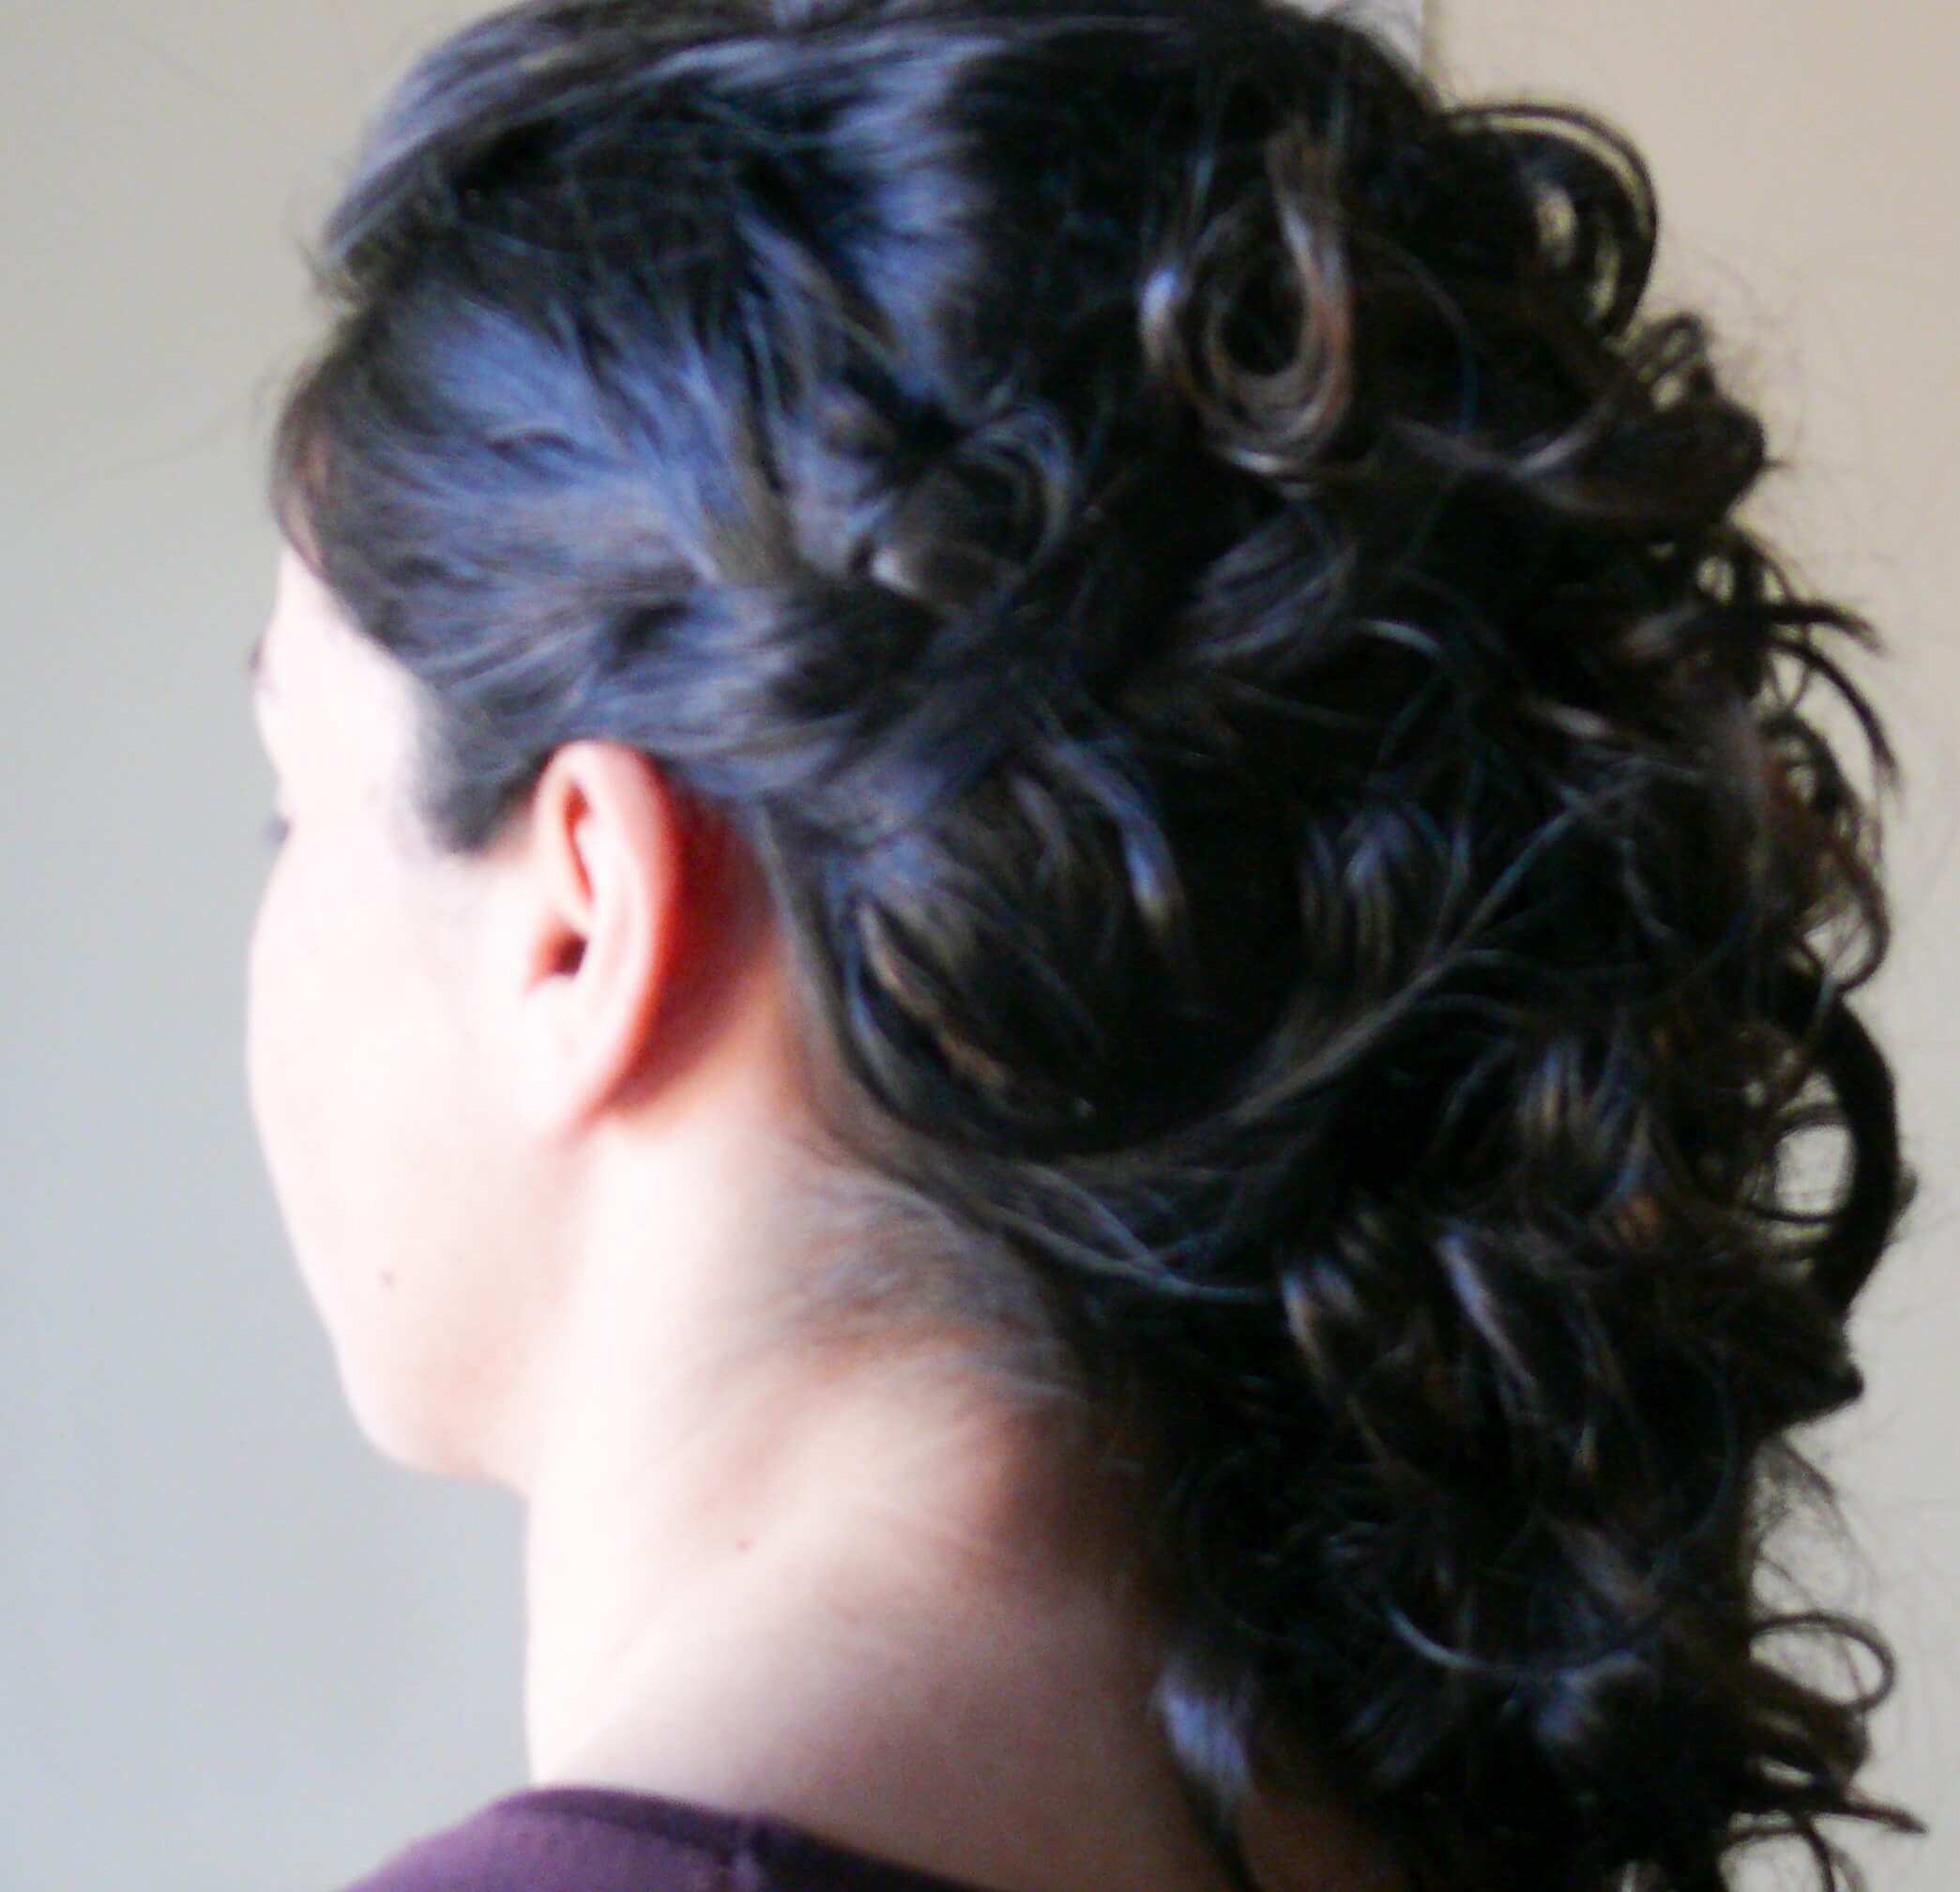 prueba-novia-peluqueria-semirecogido-4